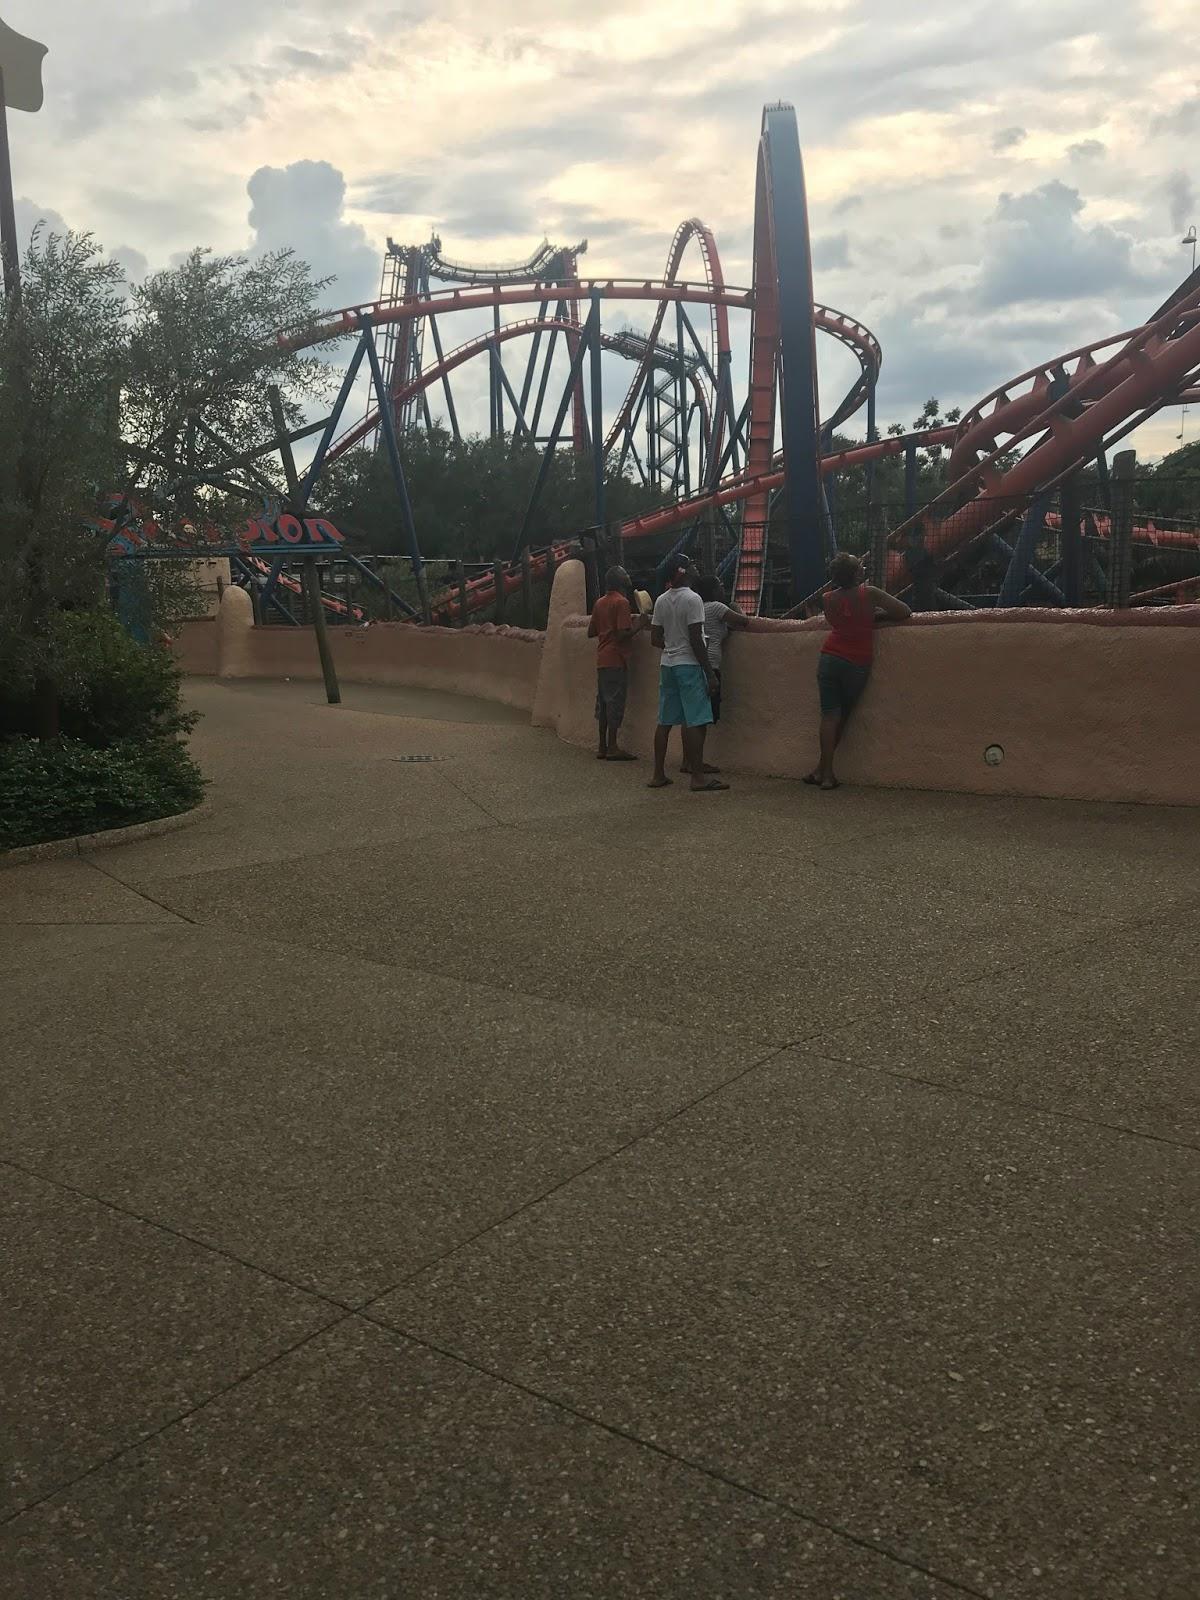 Trip Report: Busch Gardens Tampa Bay: Part 2 of 3